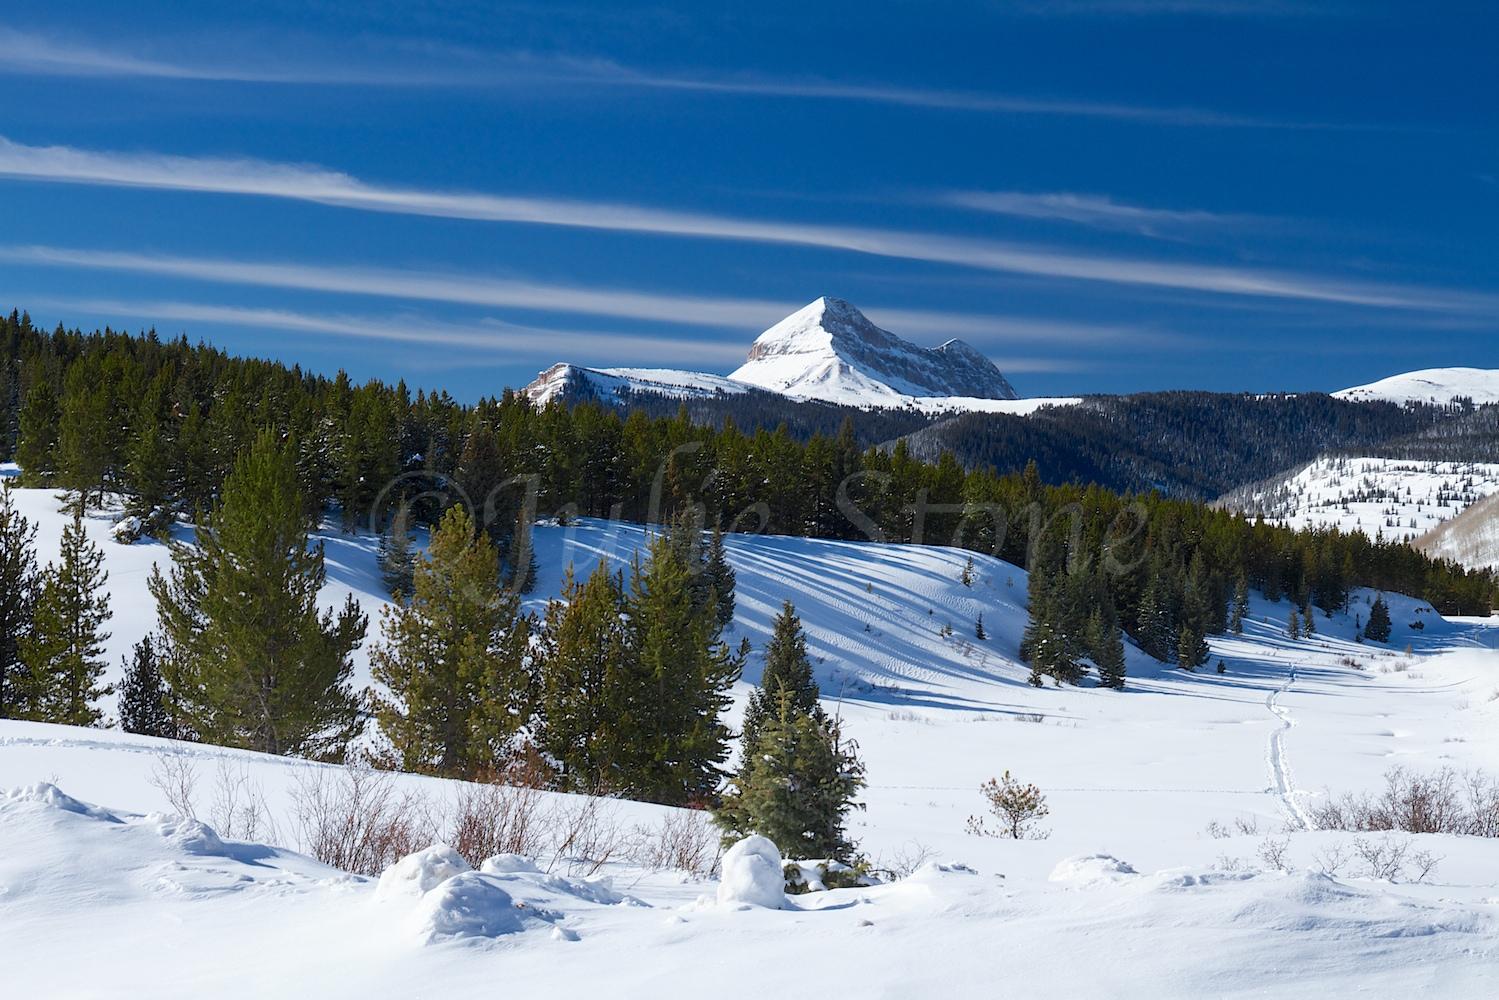 Engineer Mt (Image 2238) December 24, 2014